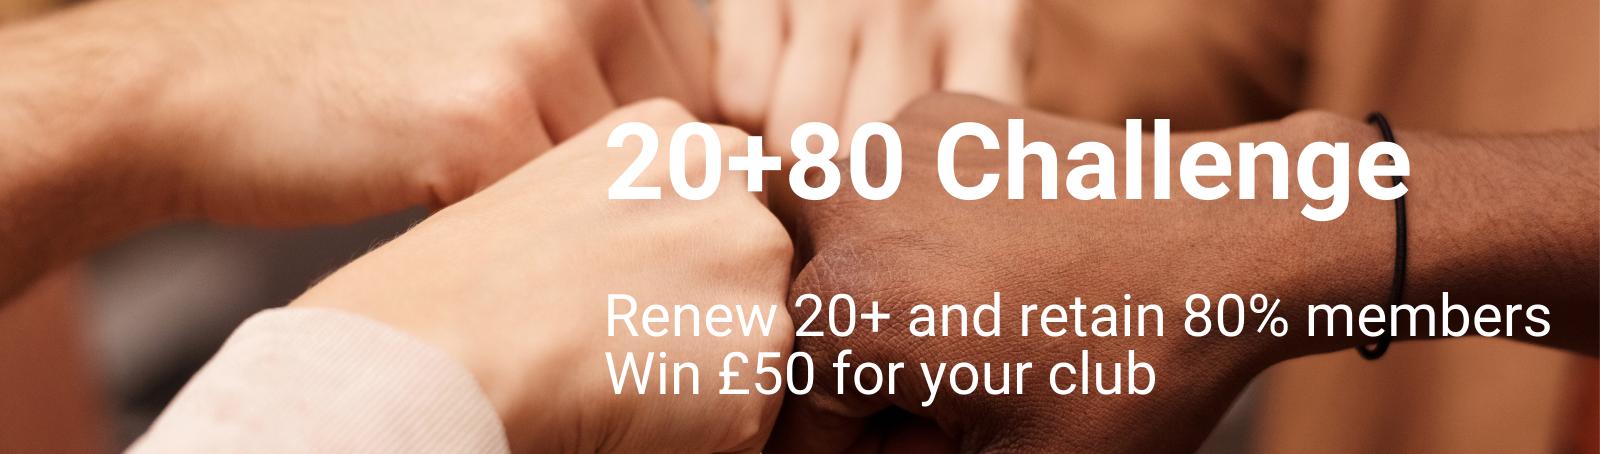 20+80 Challenge